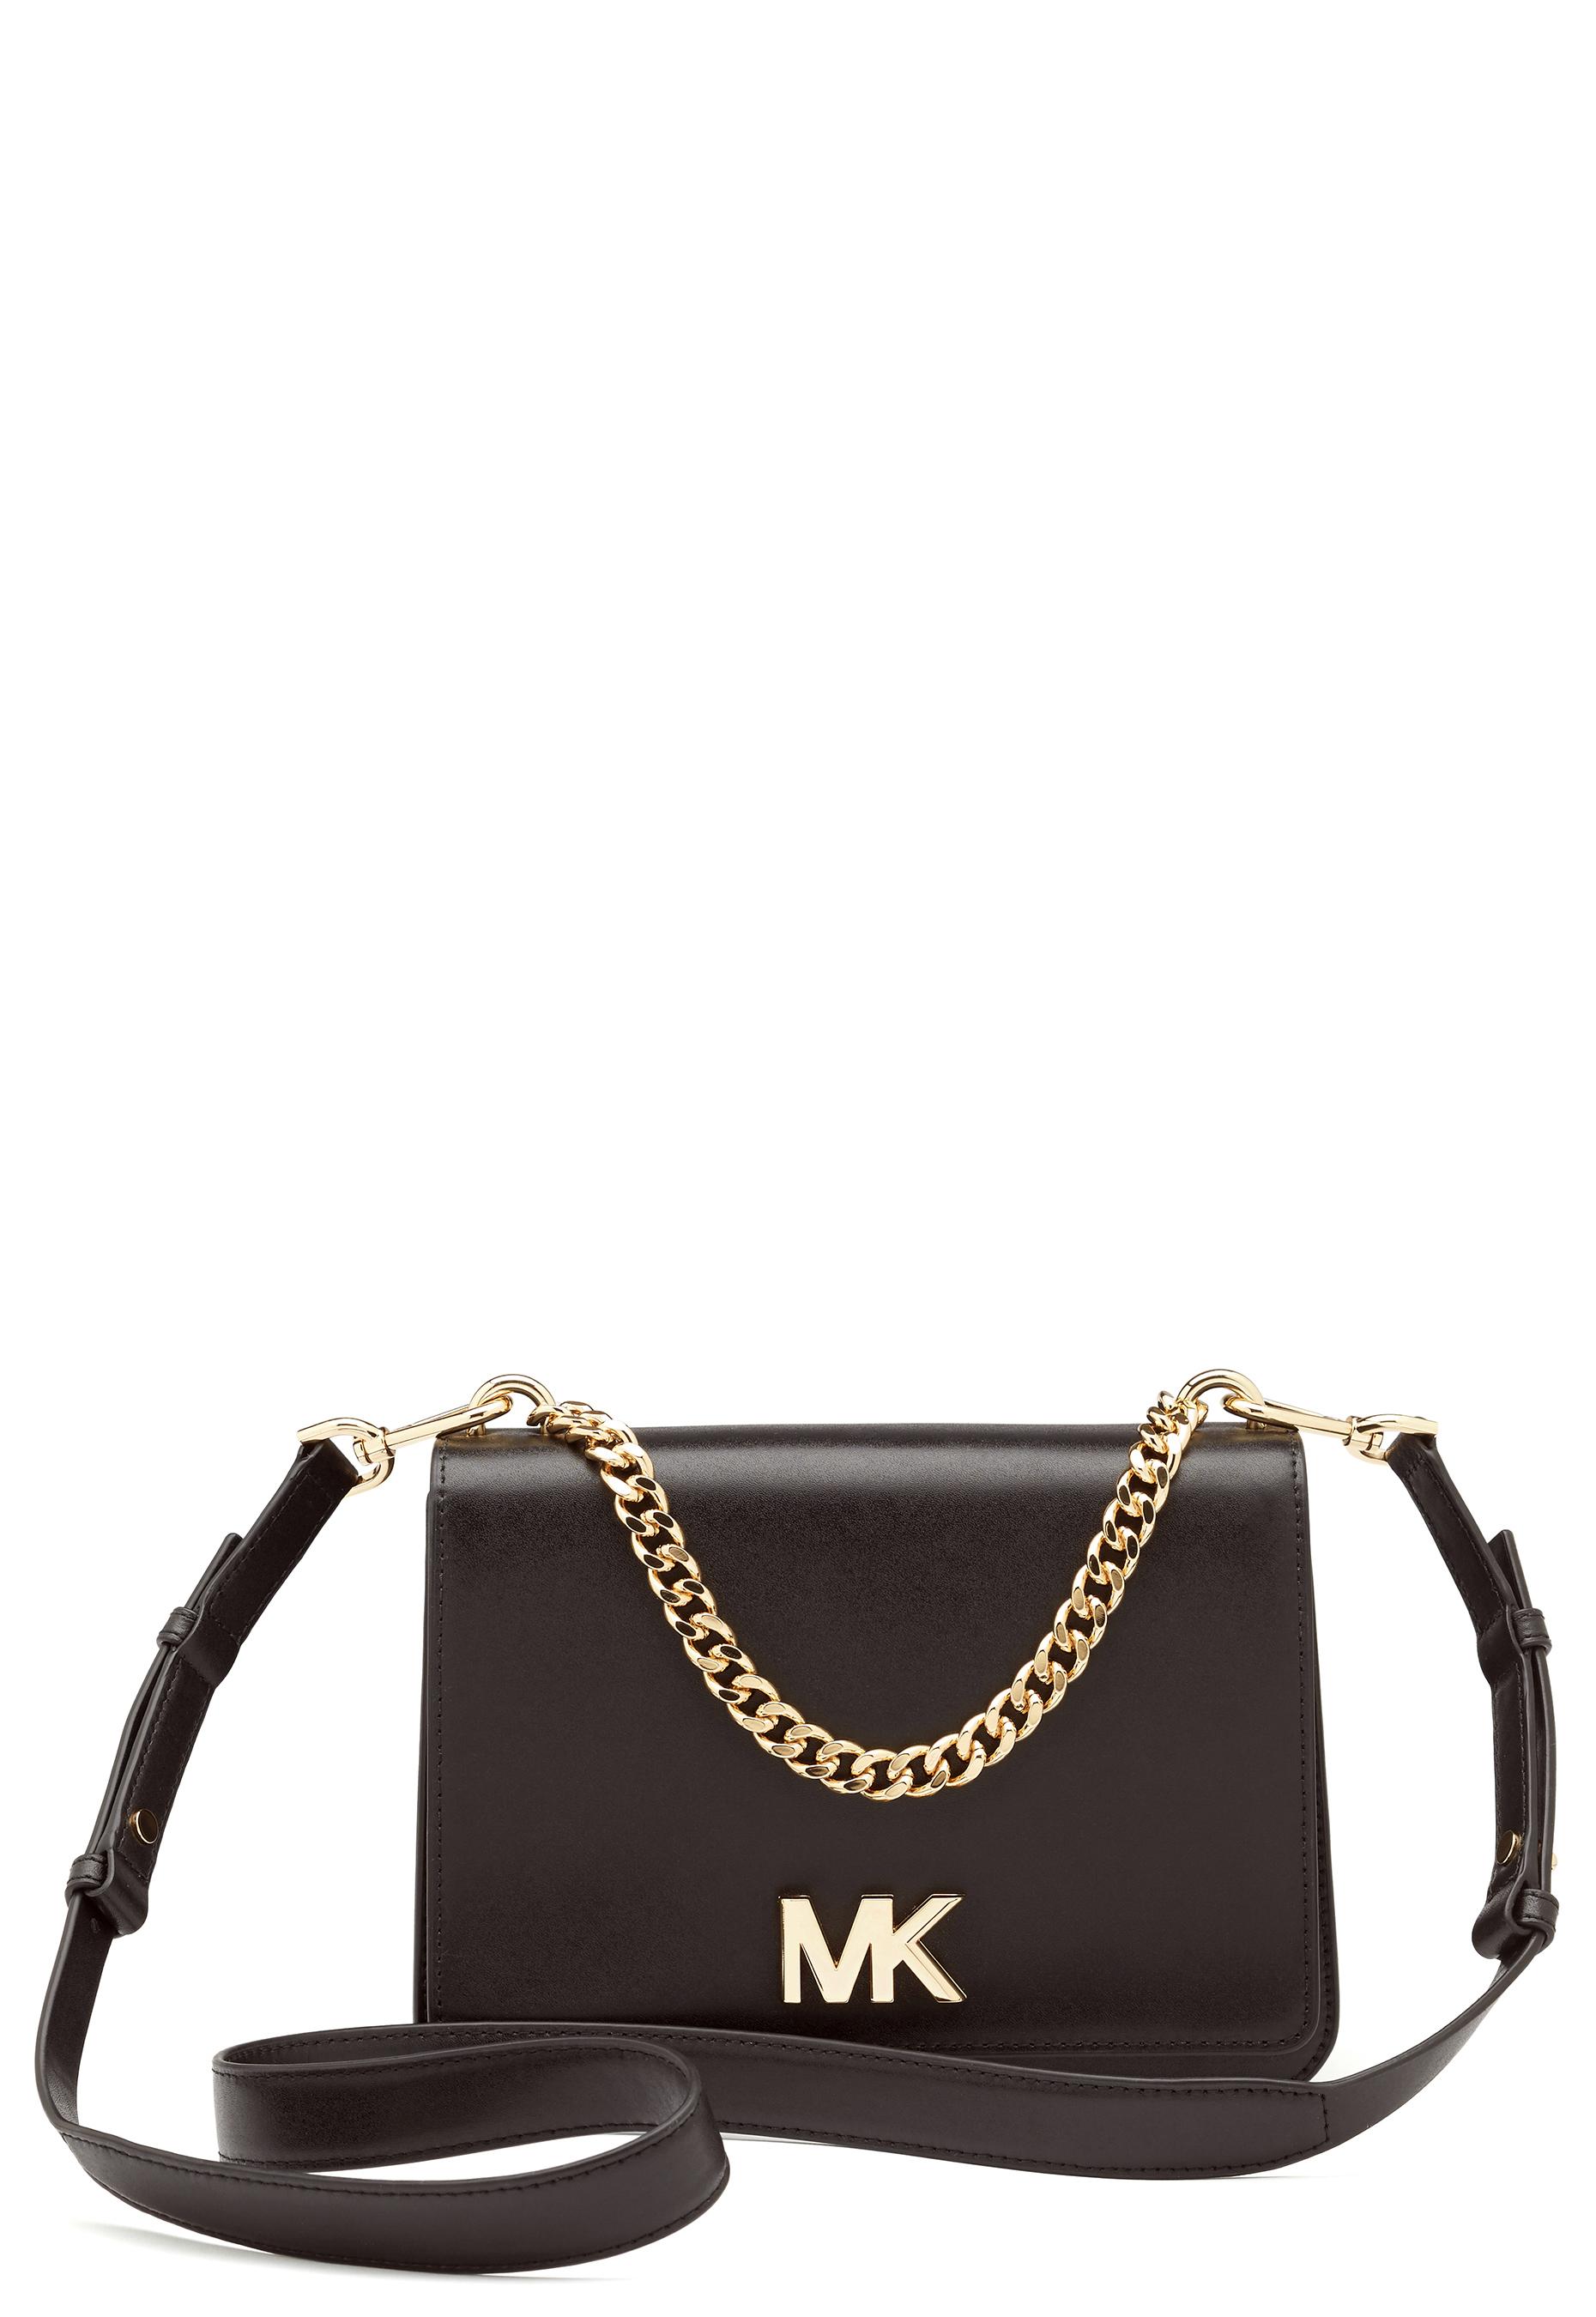 4694995ae7e7 Michael Michael Kors Mott Chain Shoulder Bag Black - Bubbleroom